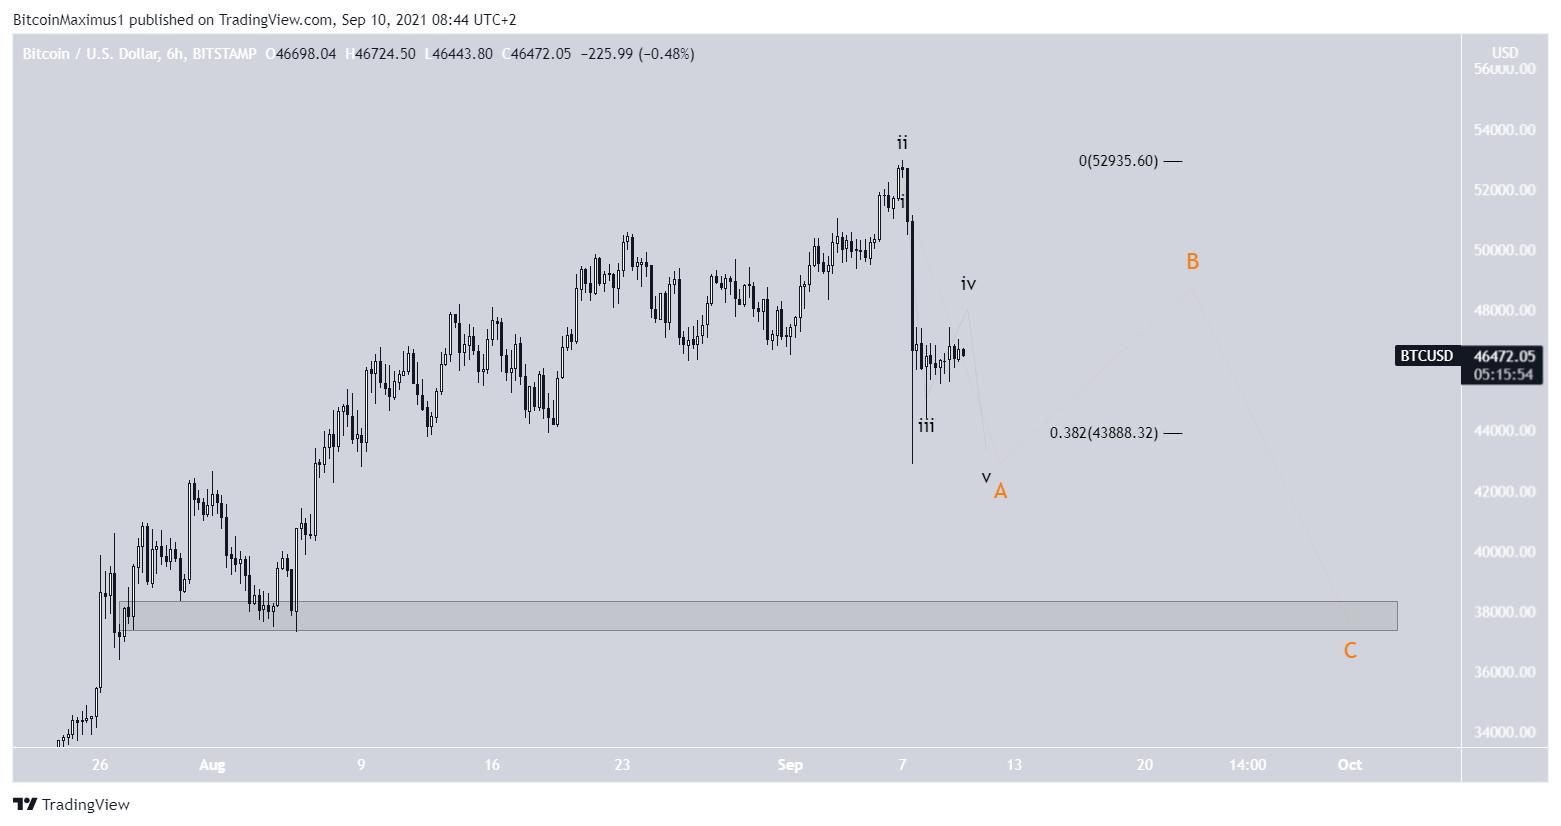 Bitcoin Kurs Preis Prognose BTC 10.09.2021 Wellenzählung